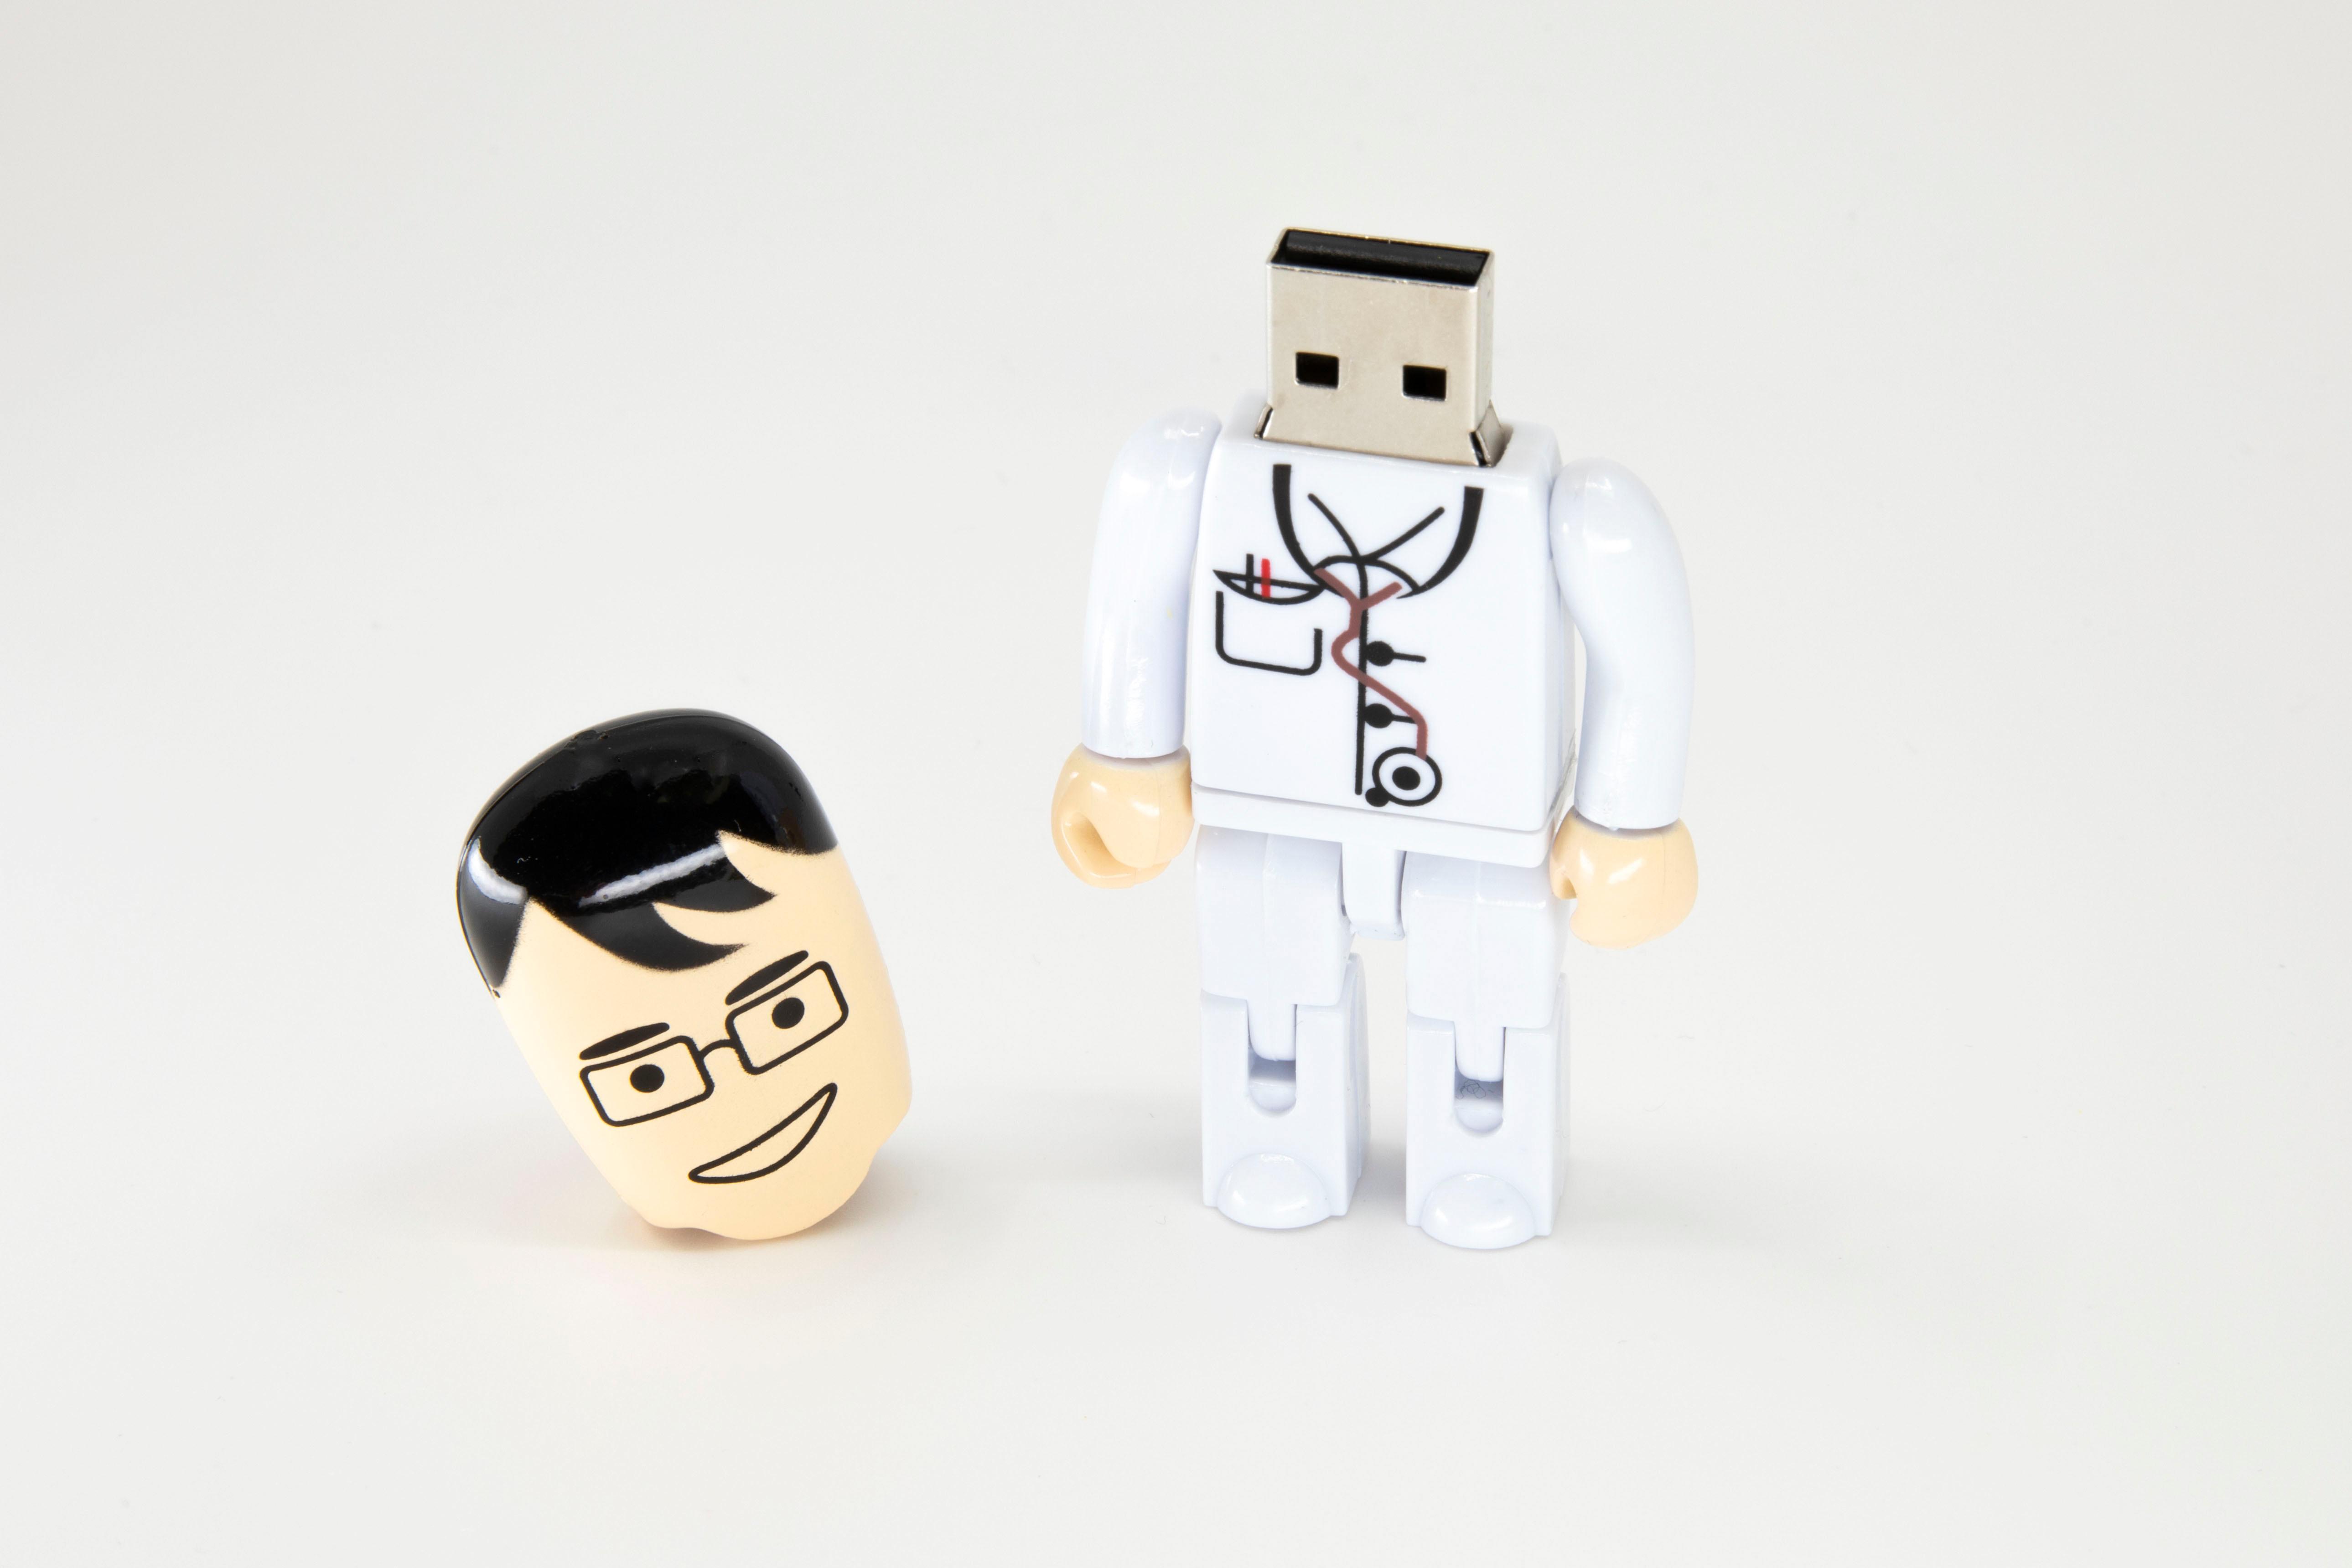 USB- und PB-Beratung